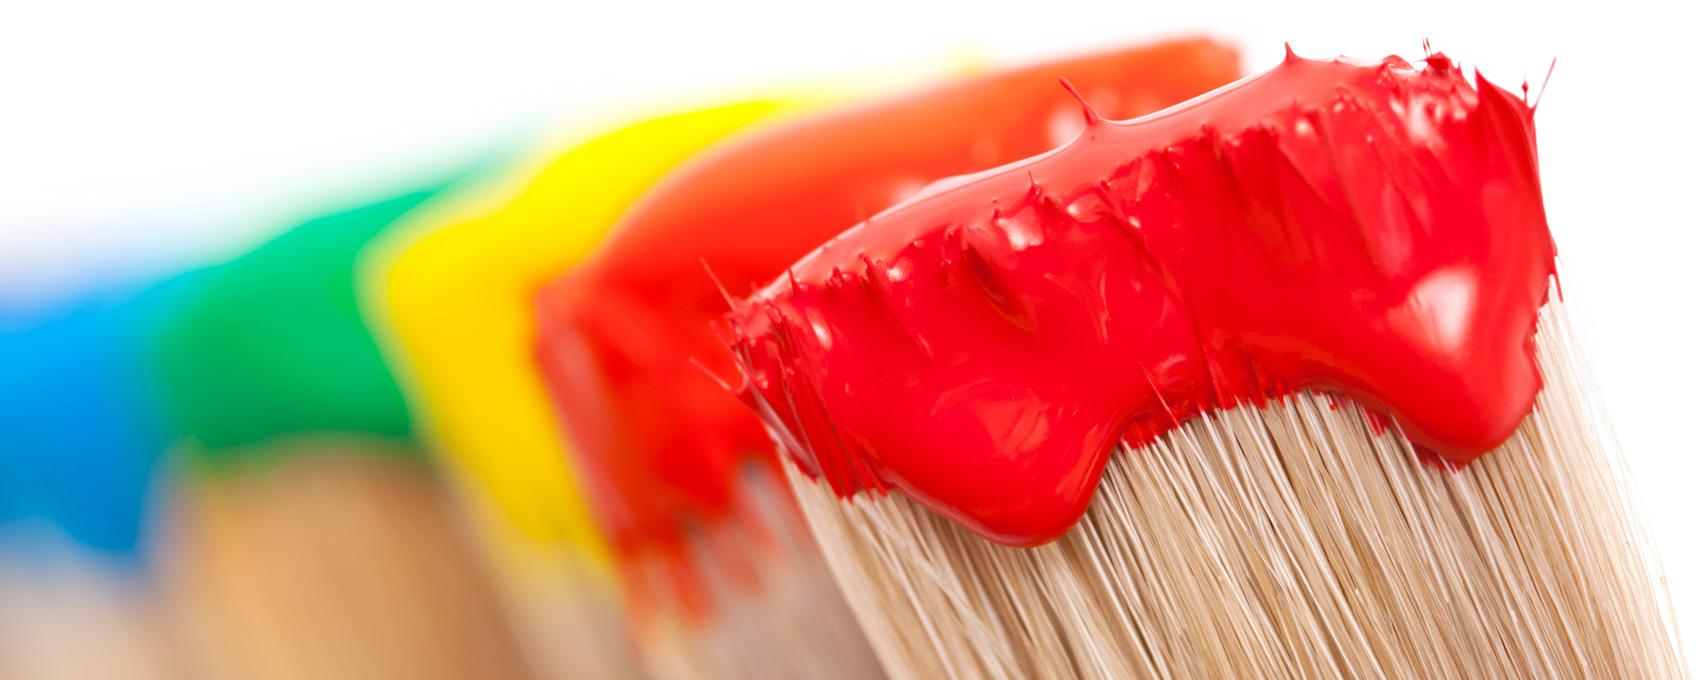 Maltec – Ihr Malerbetrieb mit Mehrwert.Foto © infografick - shutterstock.com